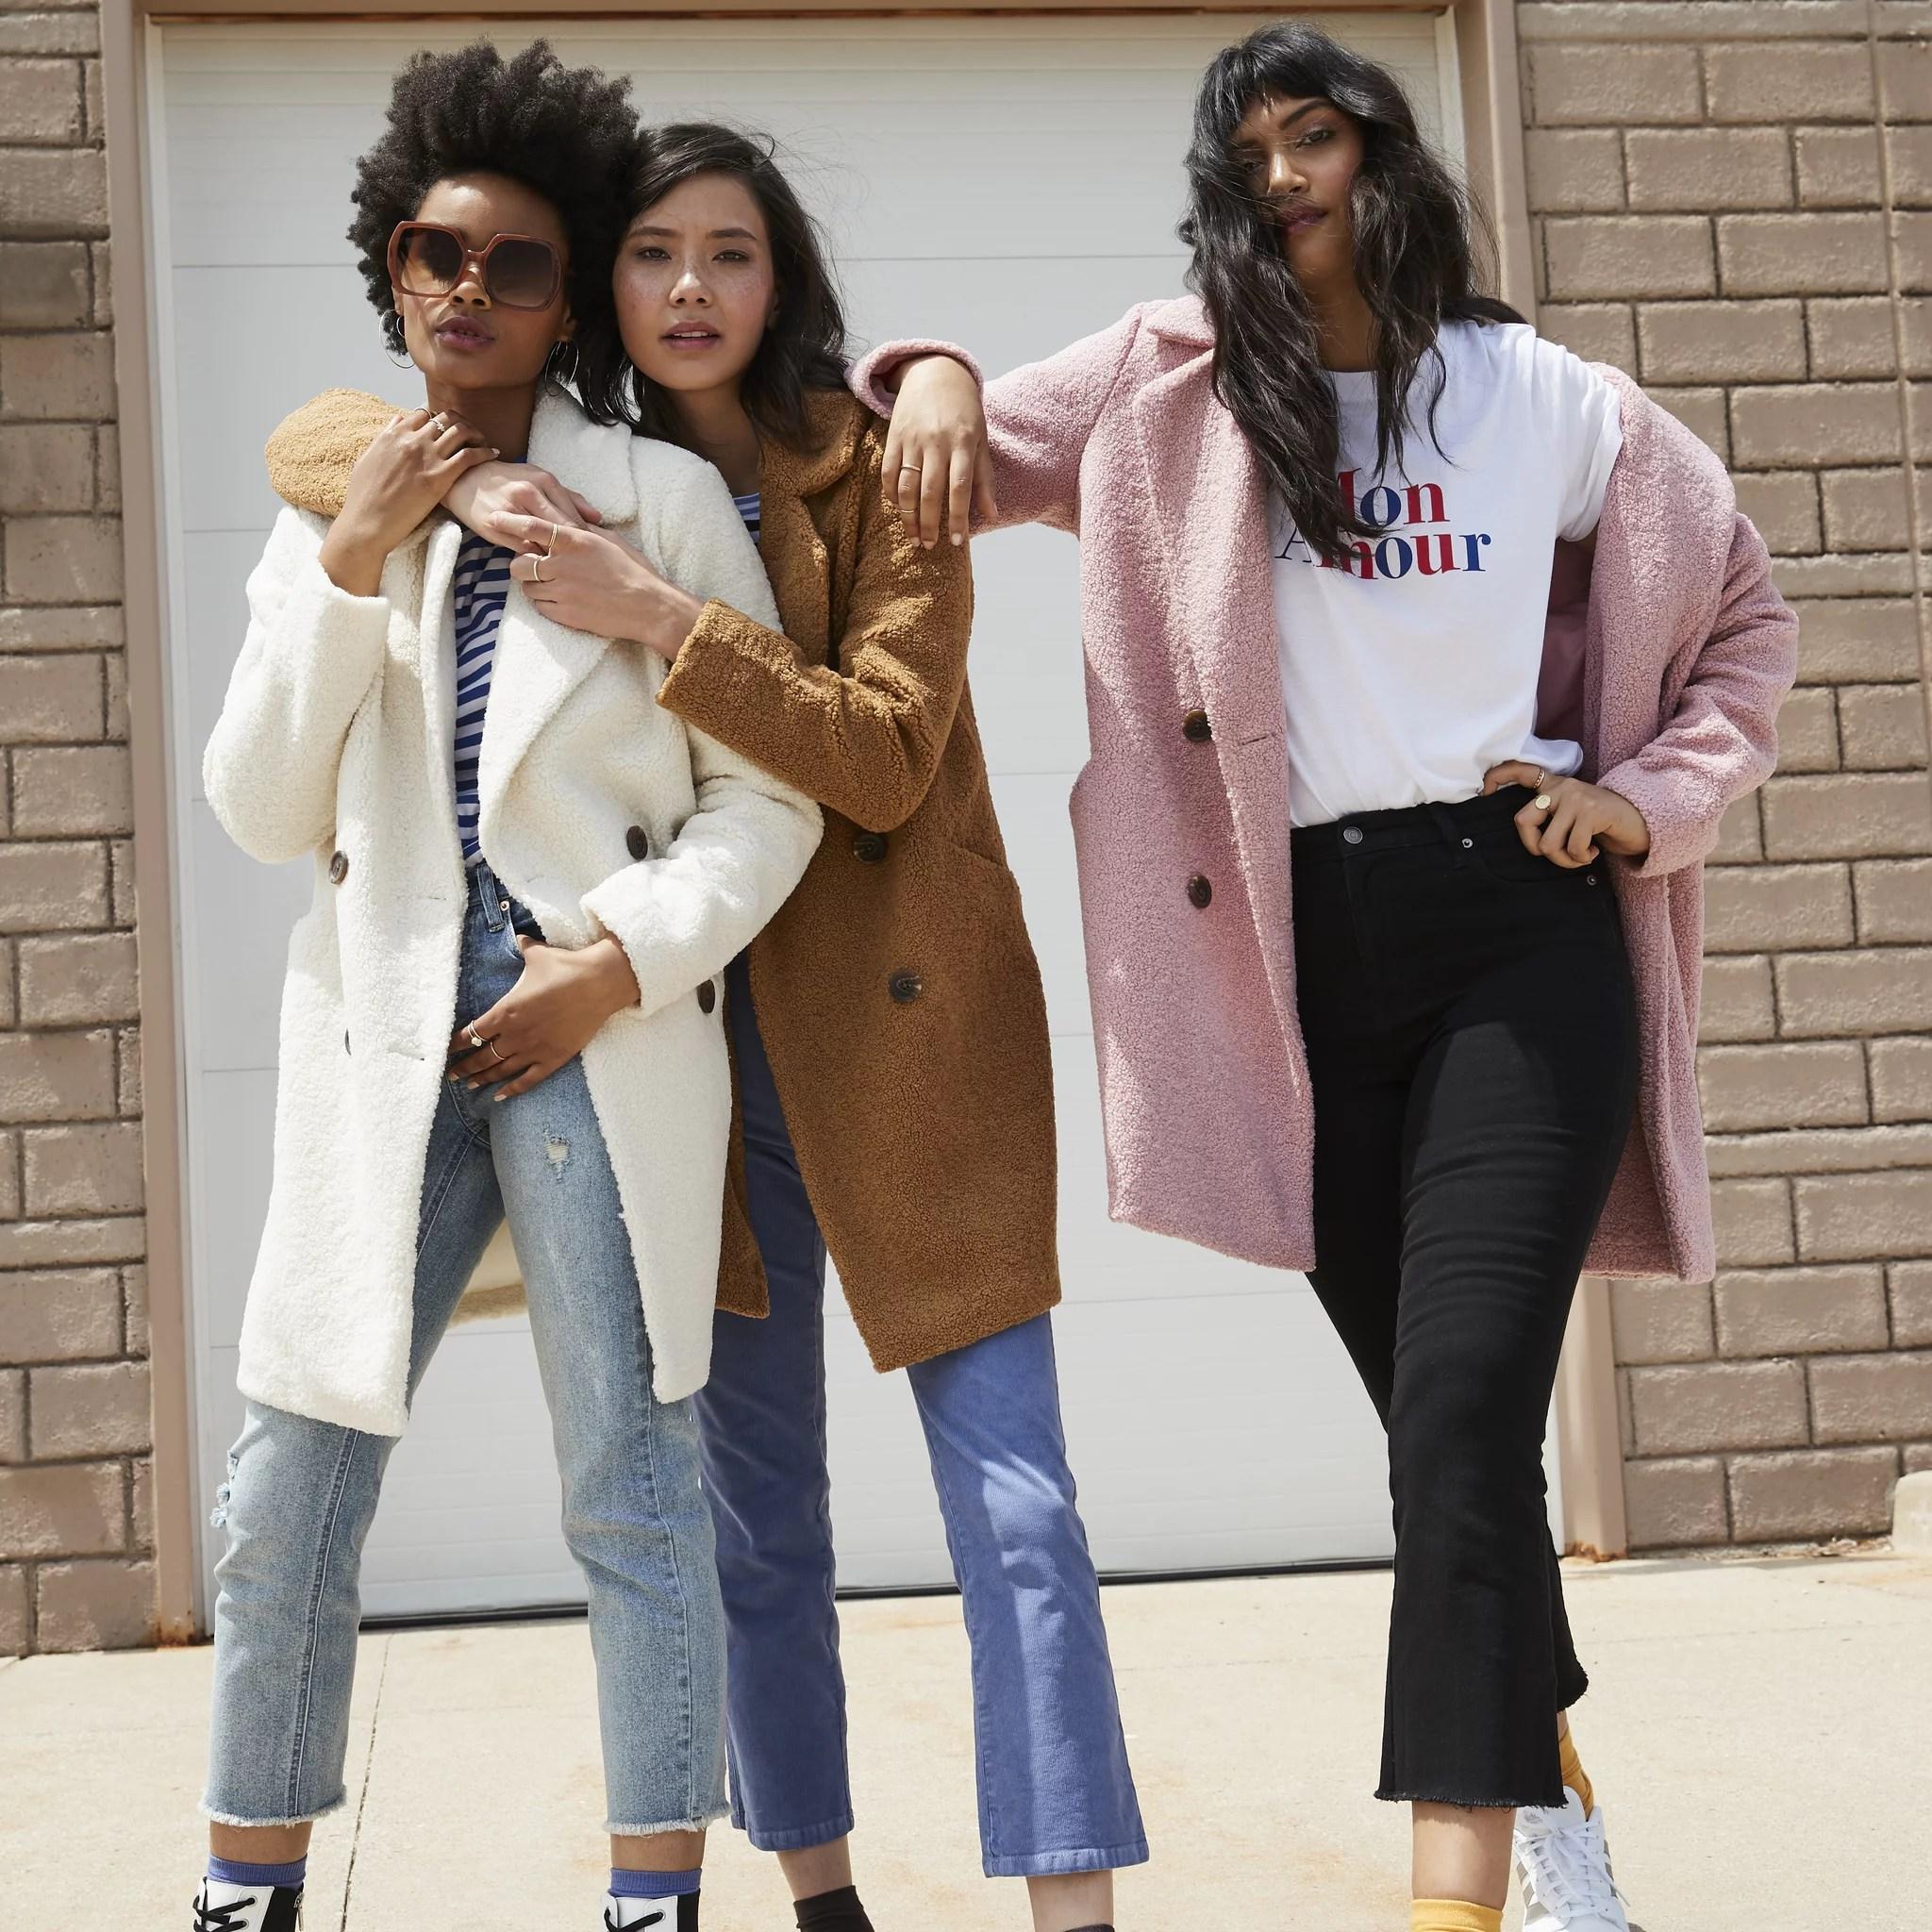 best jeans on sale at nordstrom rack